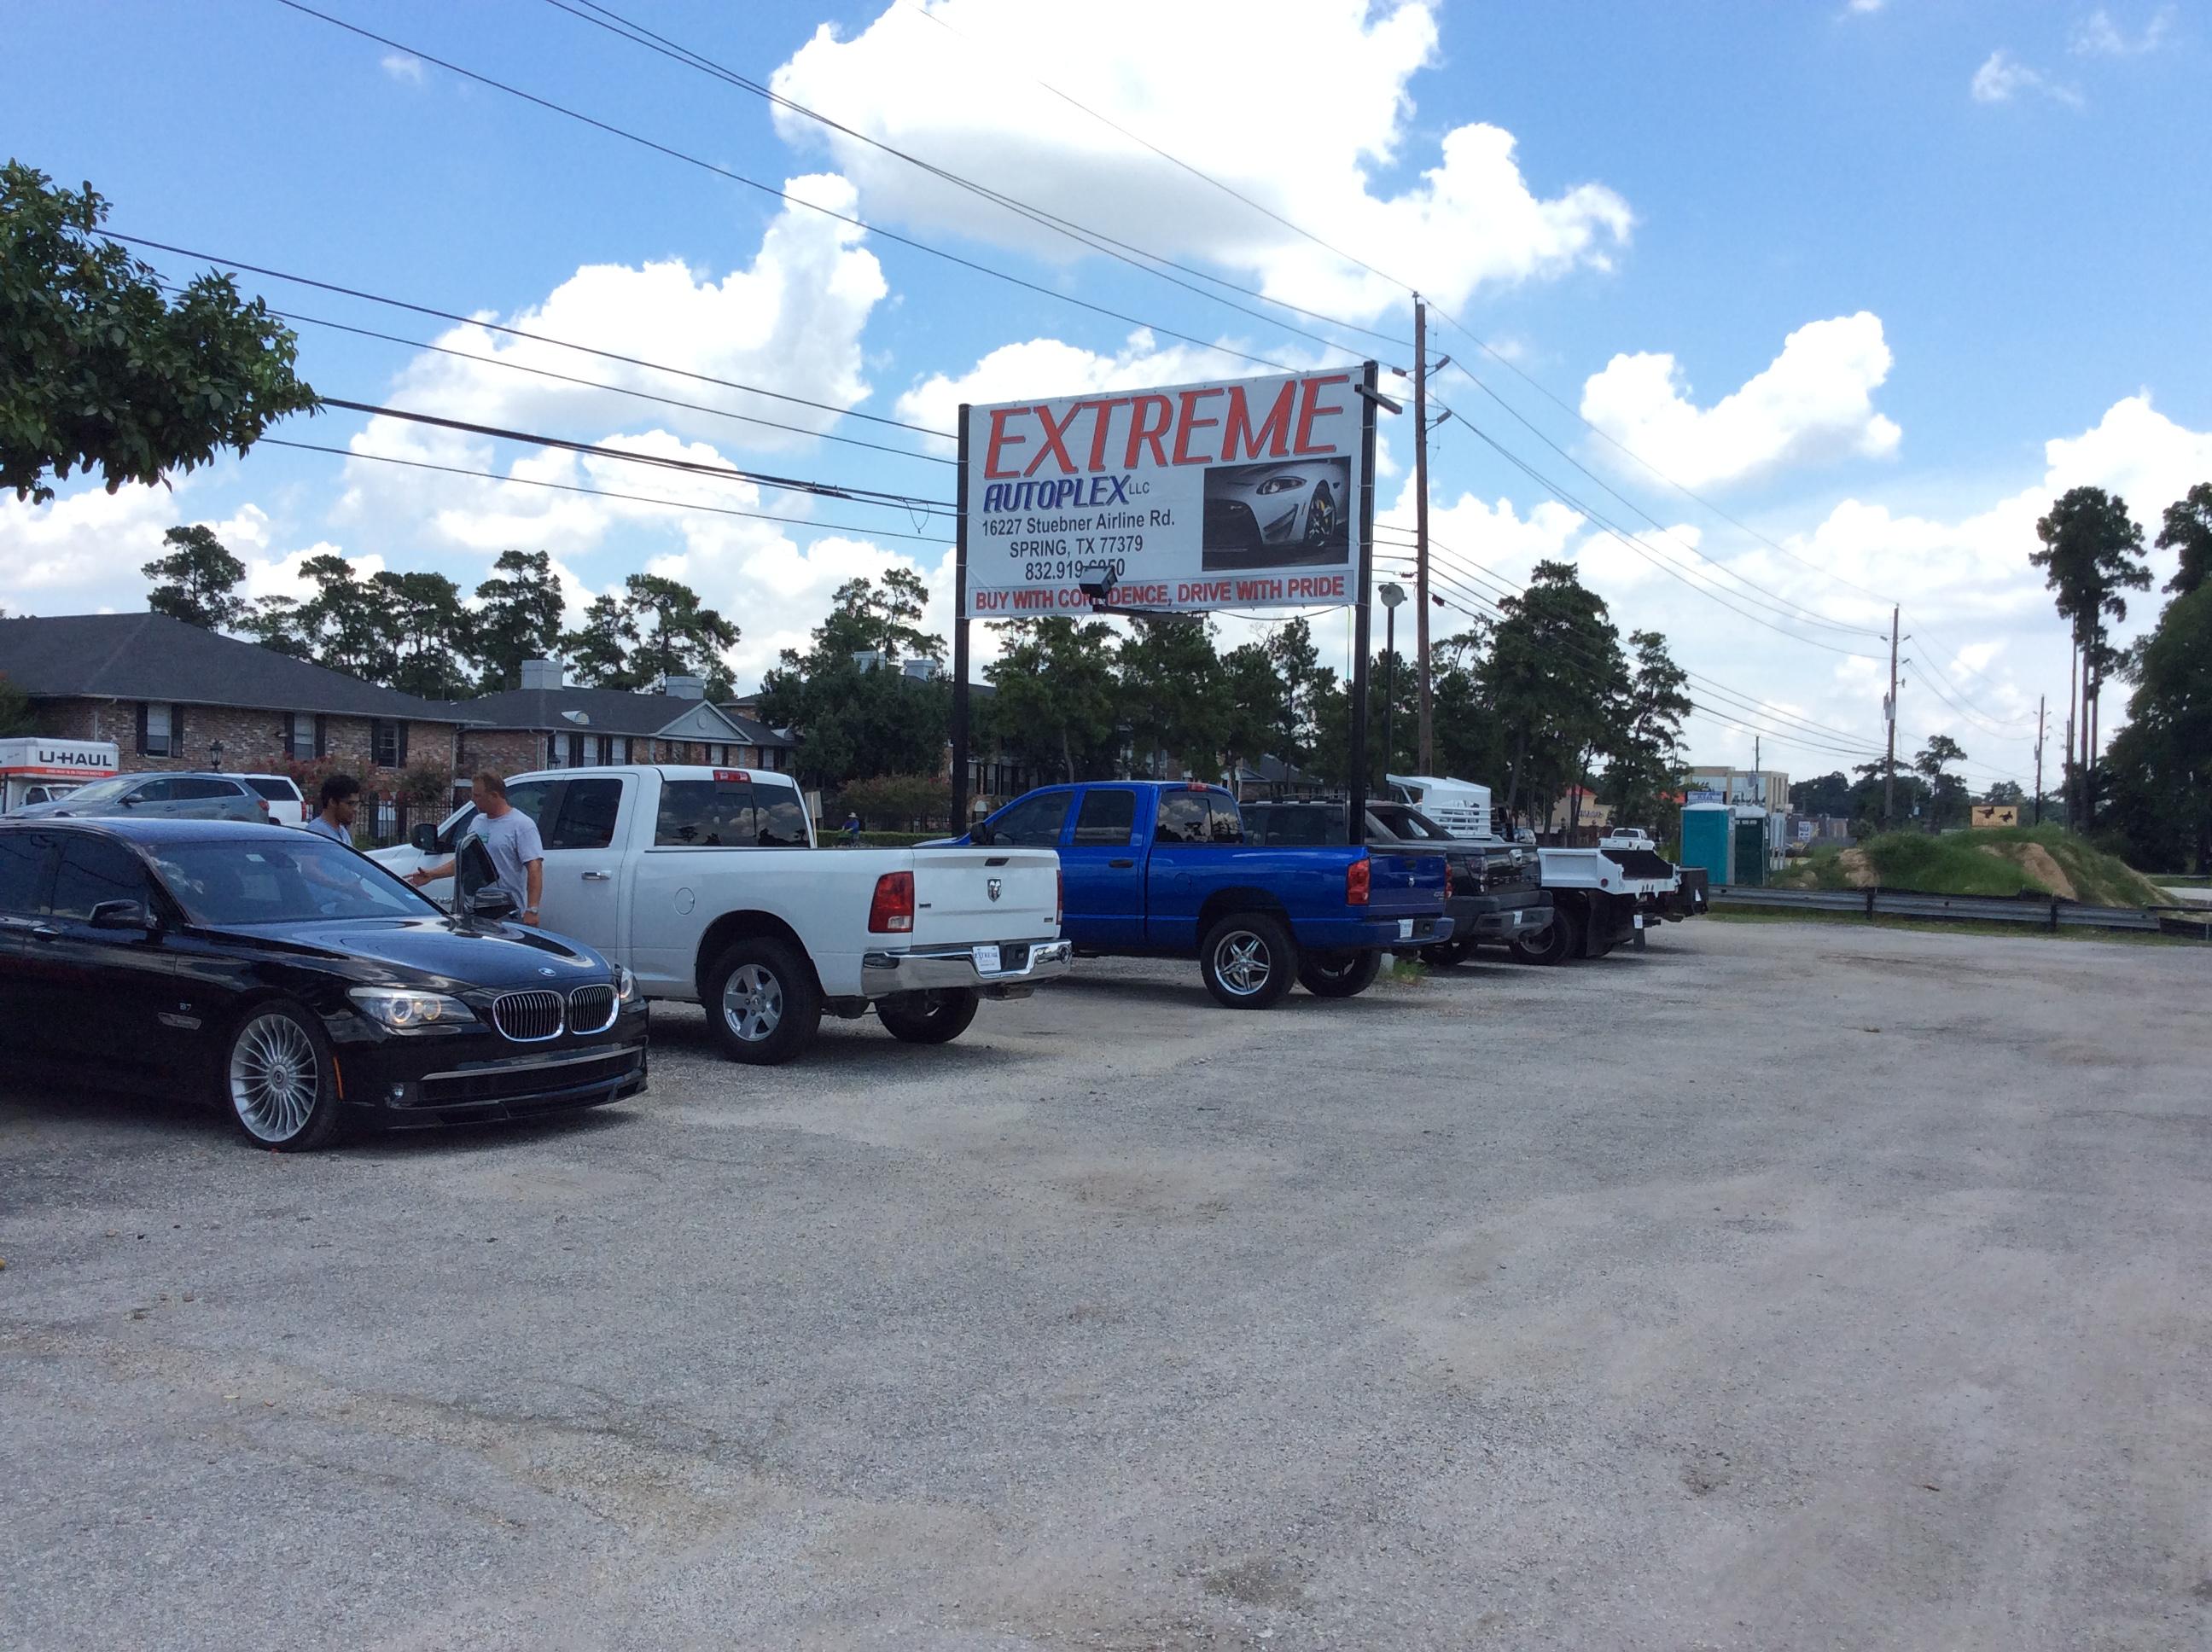 Extreme Autoplex LLC image 1